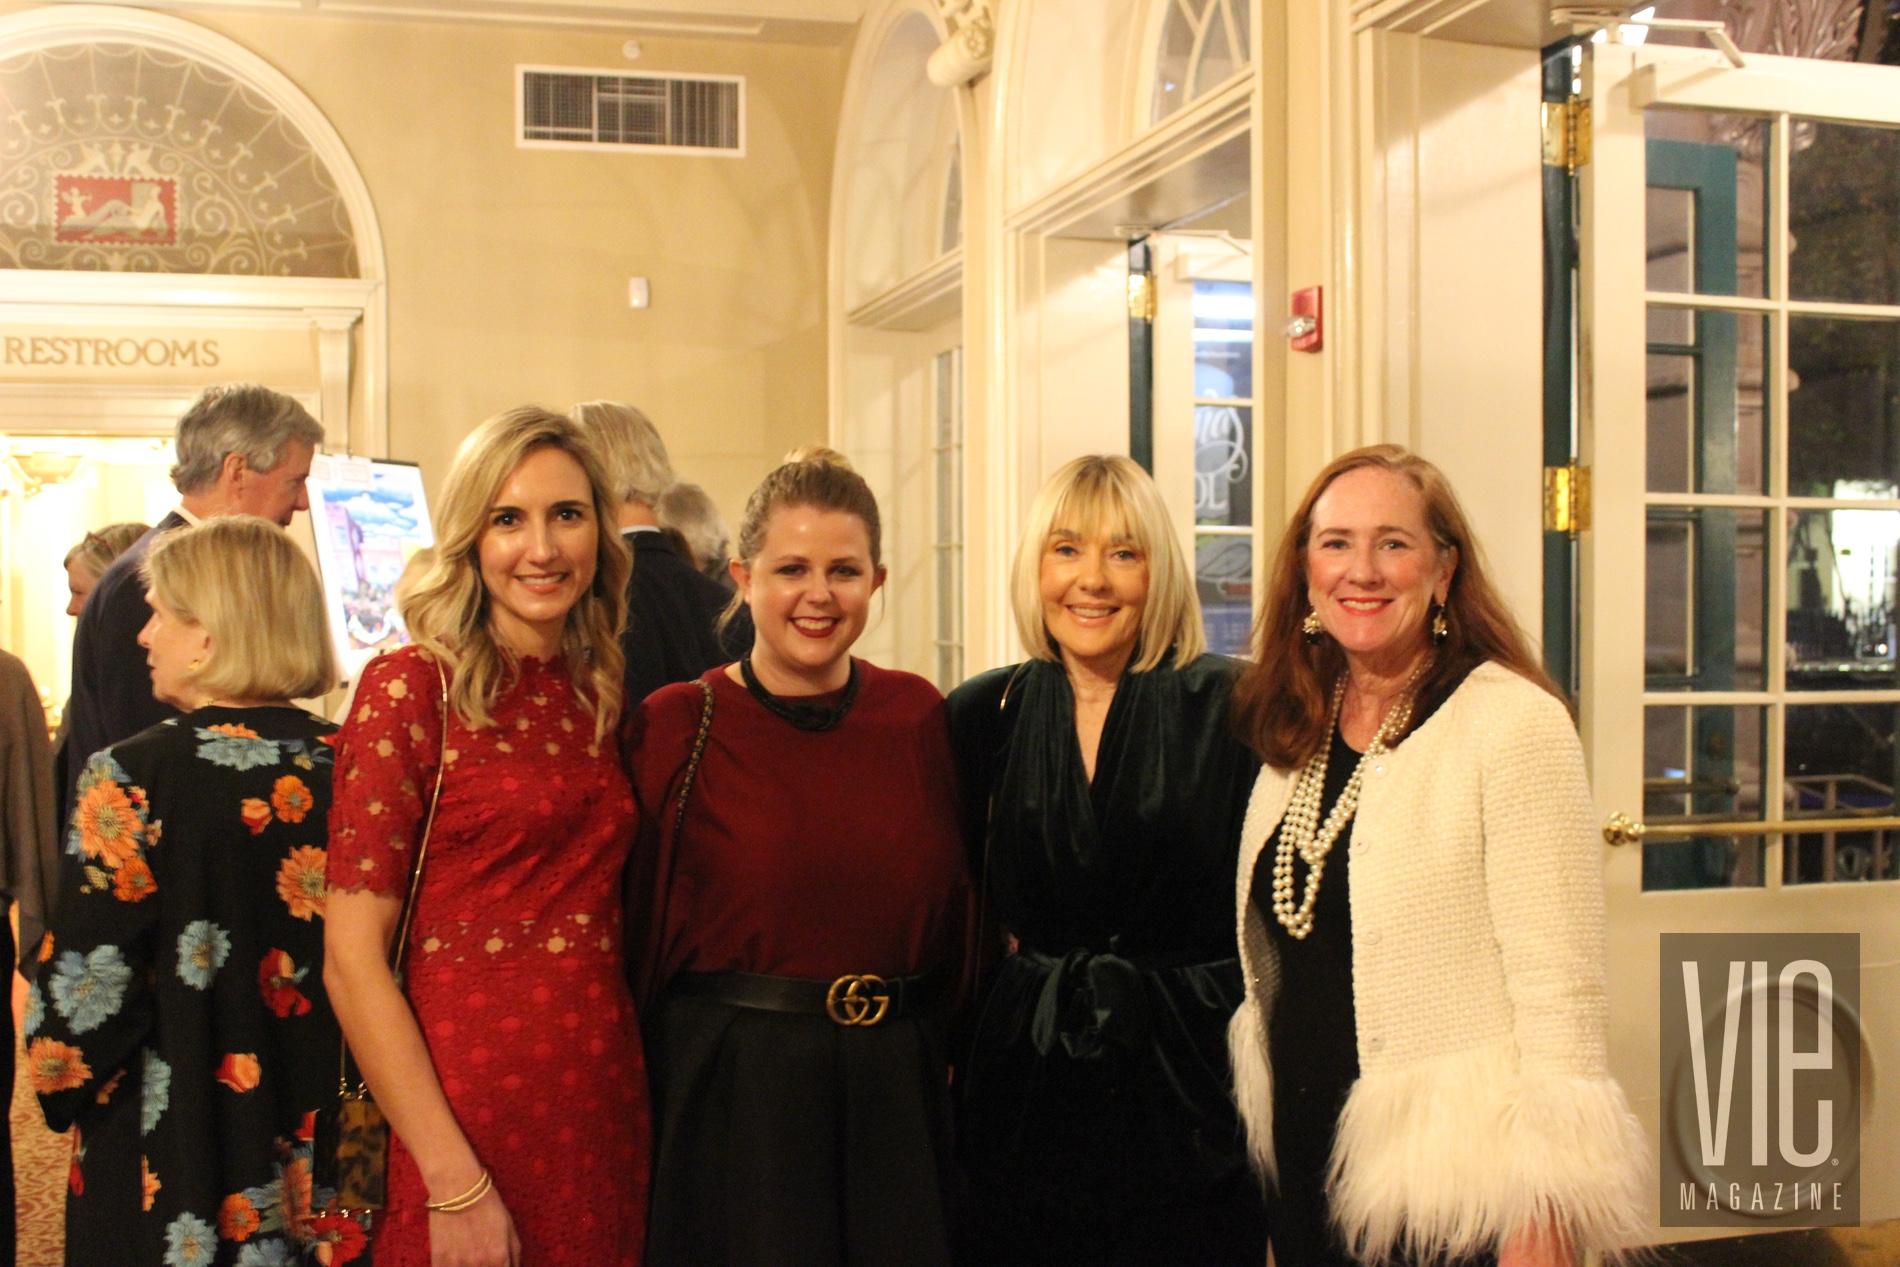 VIE magazine Charleston Literary Festival Lisa Burwell Tracey Thomas Jordan Staggs Marianne Duffey